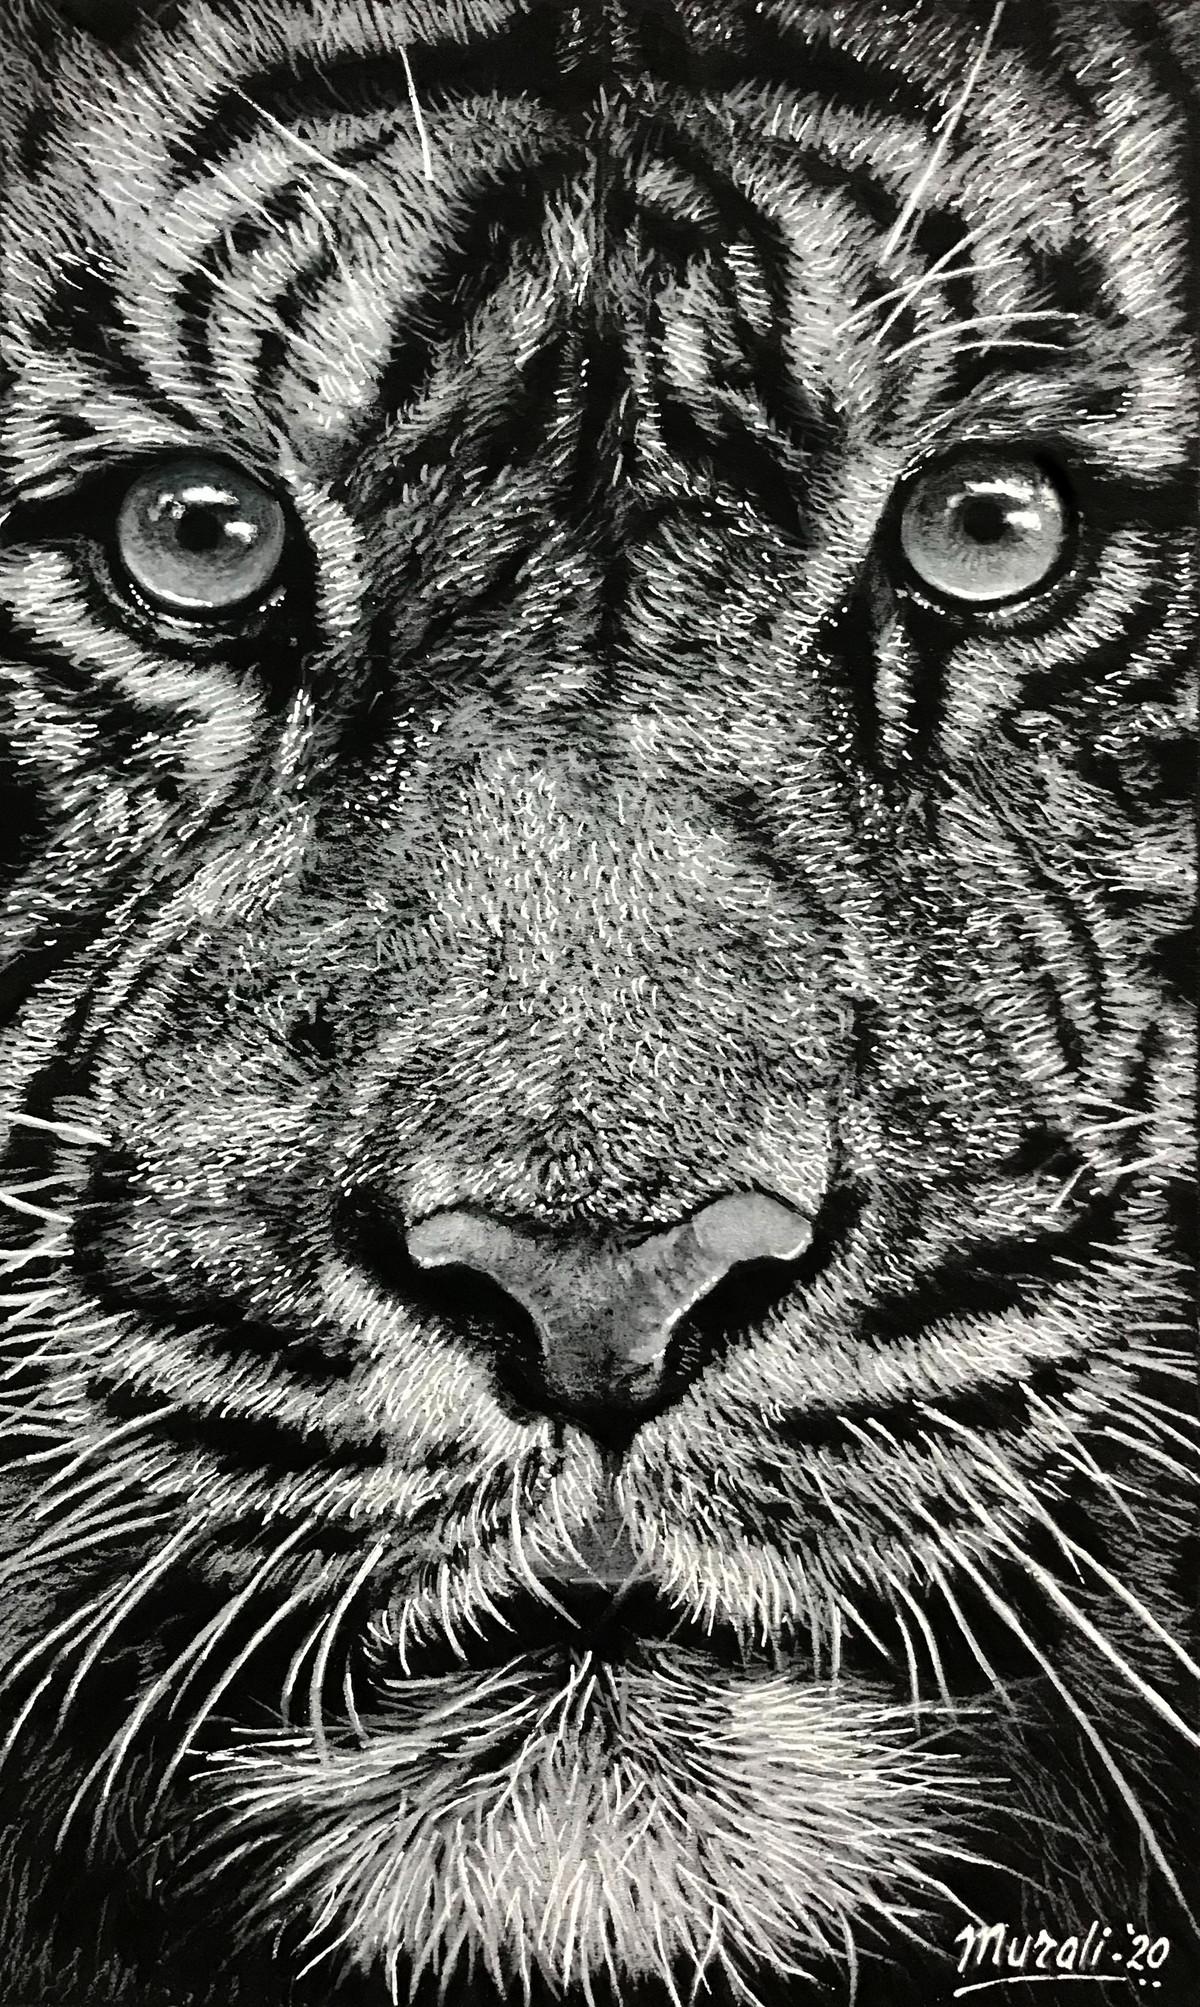 Tiger Closeup by Muralidhar Suvarna, Illustration Drawing, Pencil on Paper, Gray Nickel color